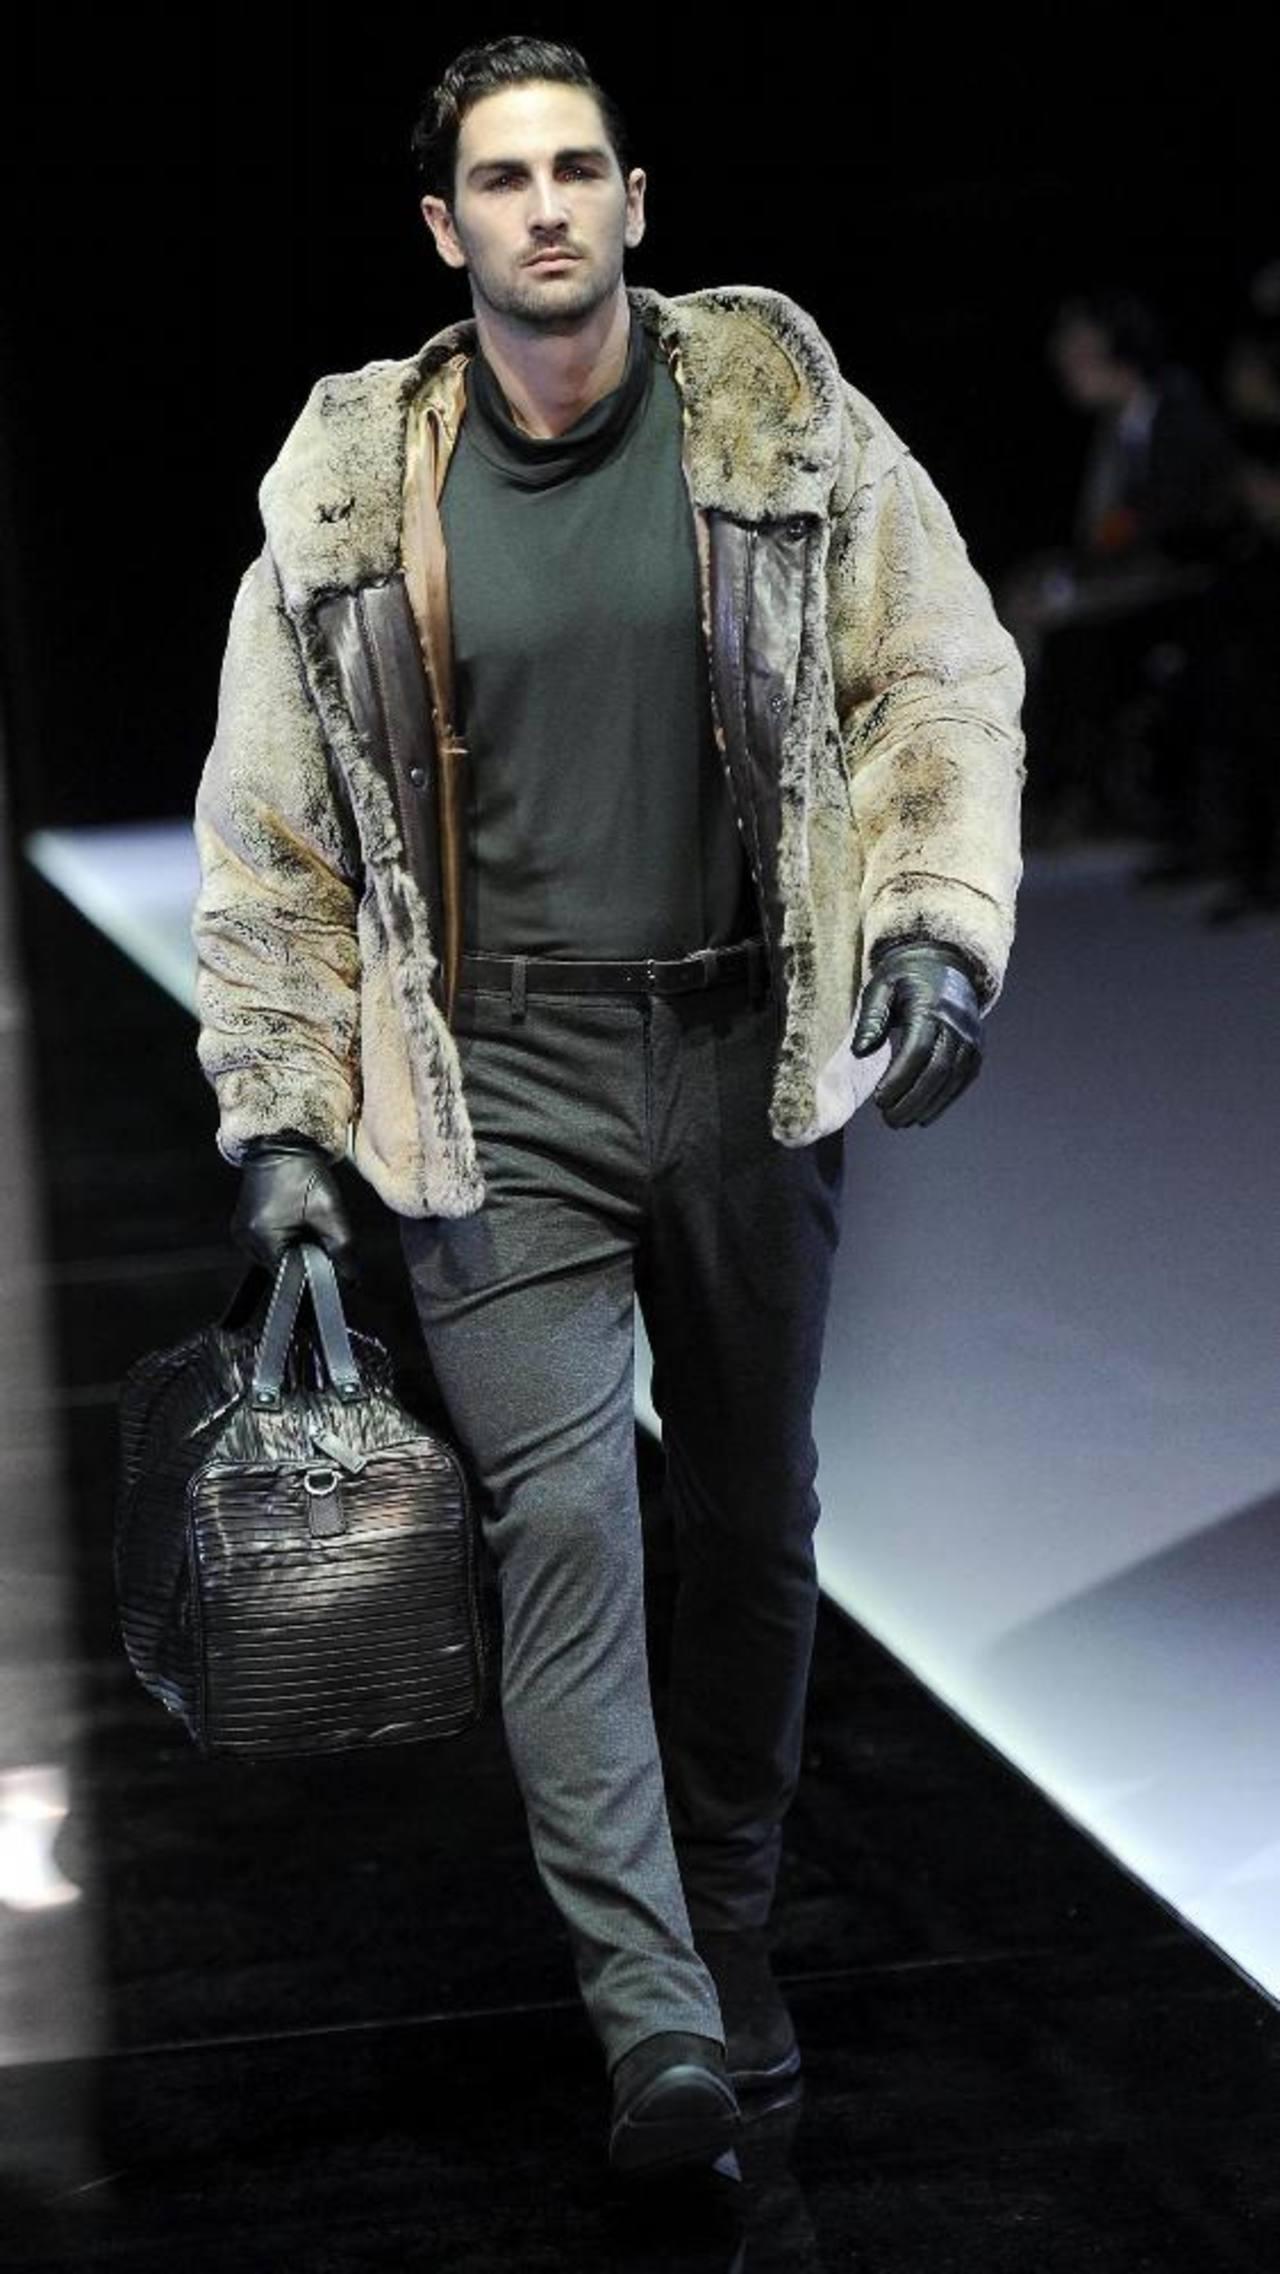 Armani cierra la Semana de la Moda Masculina de Milán